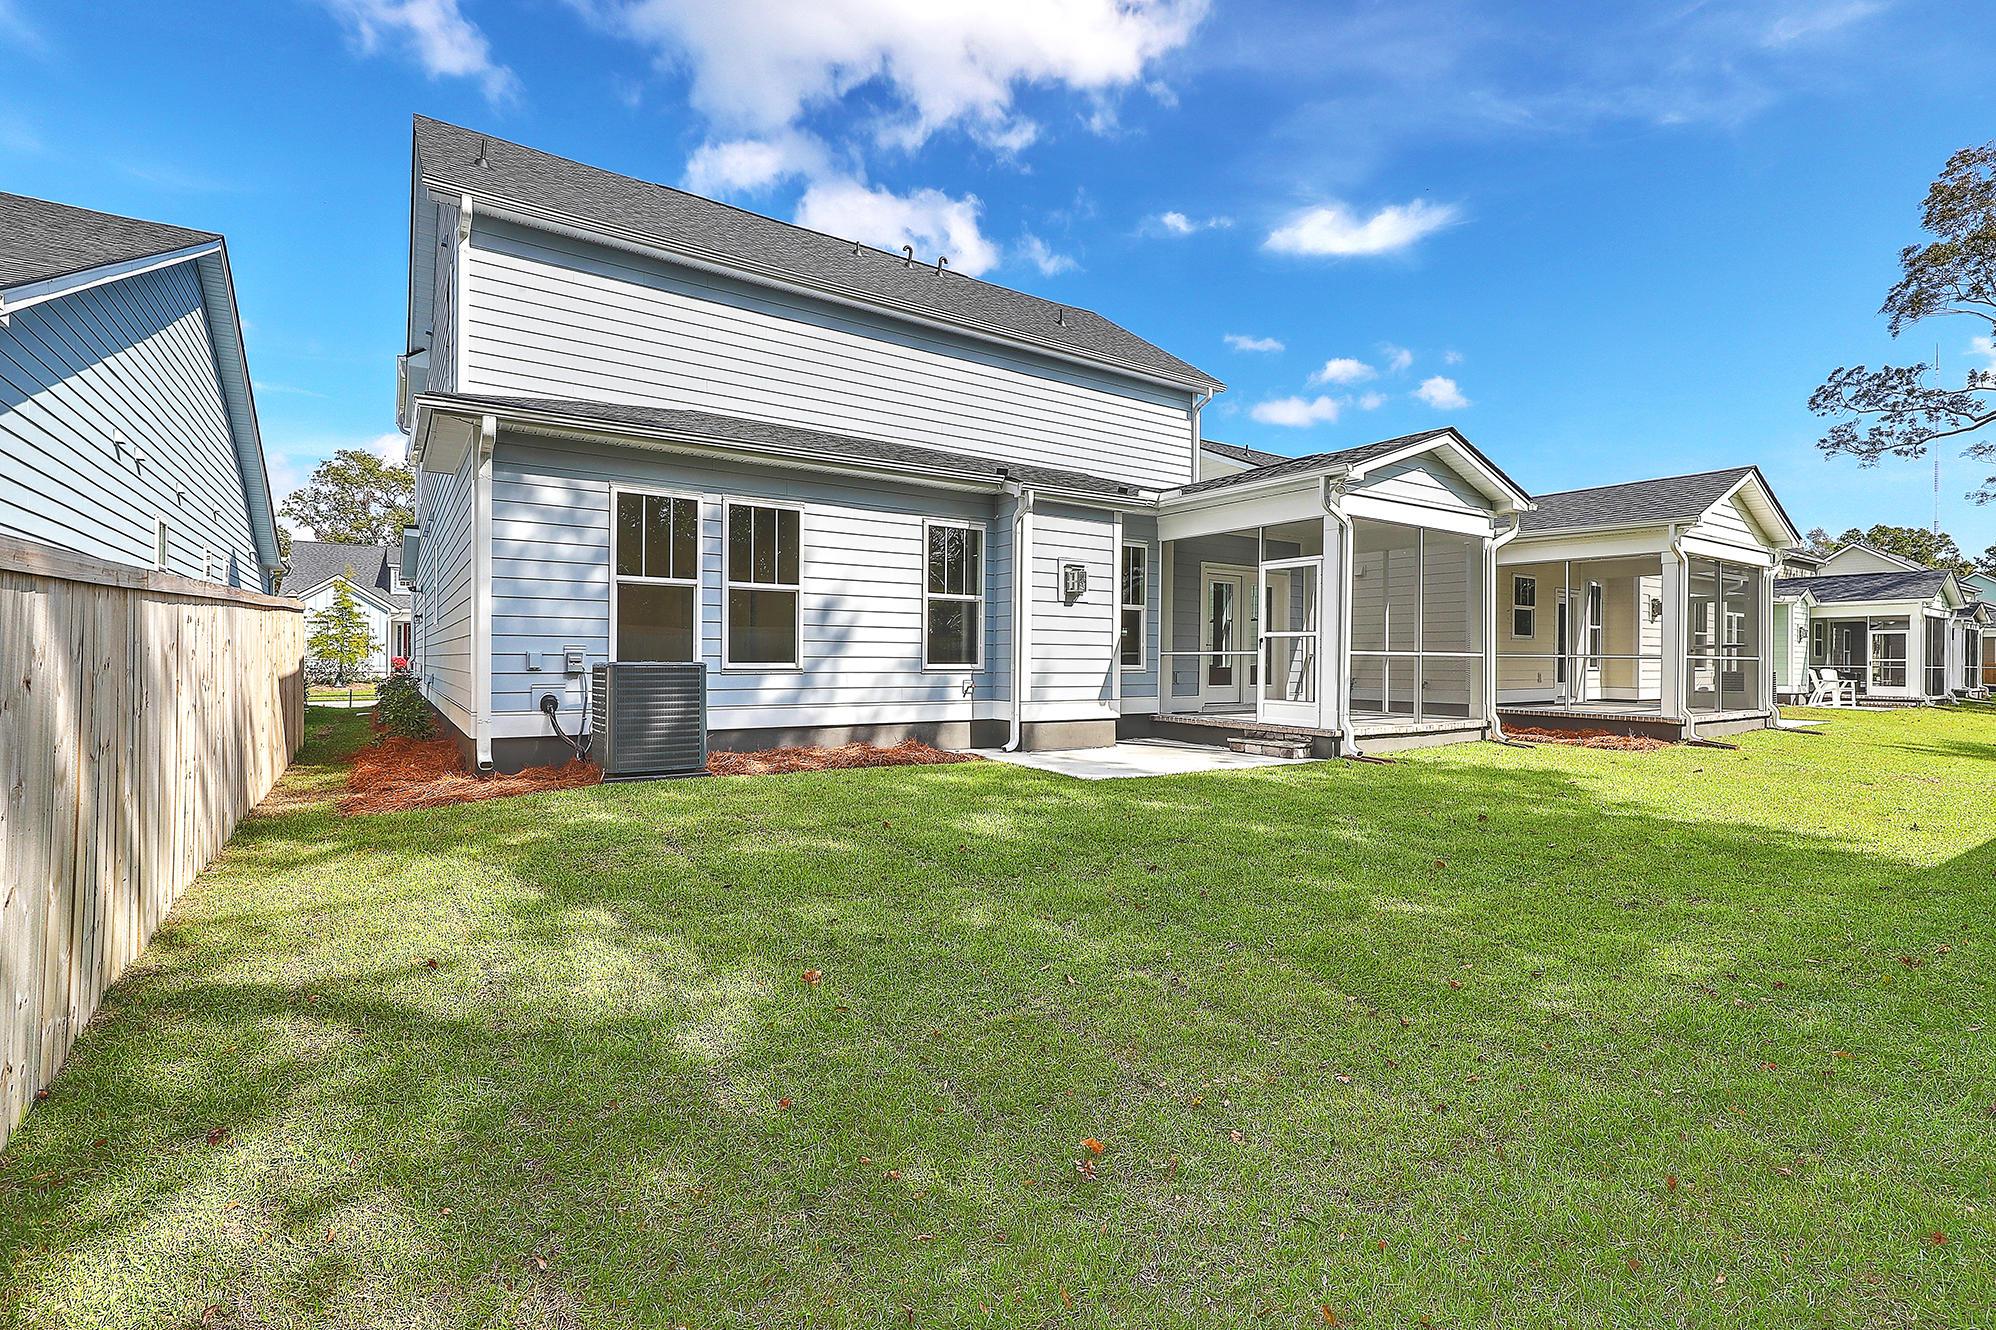 Bentley Park Homes For Sale - 1261 Gannett, Mount Pleasant, SC - 31